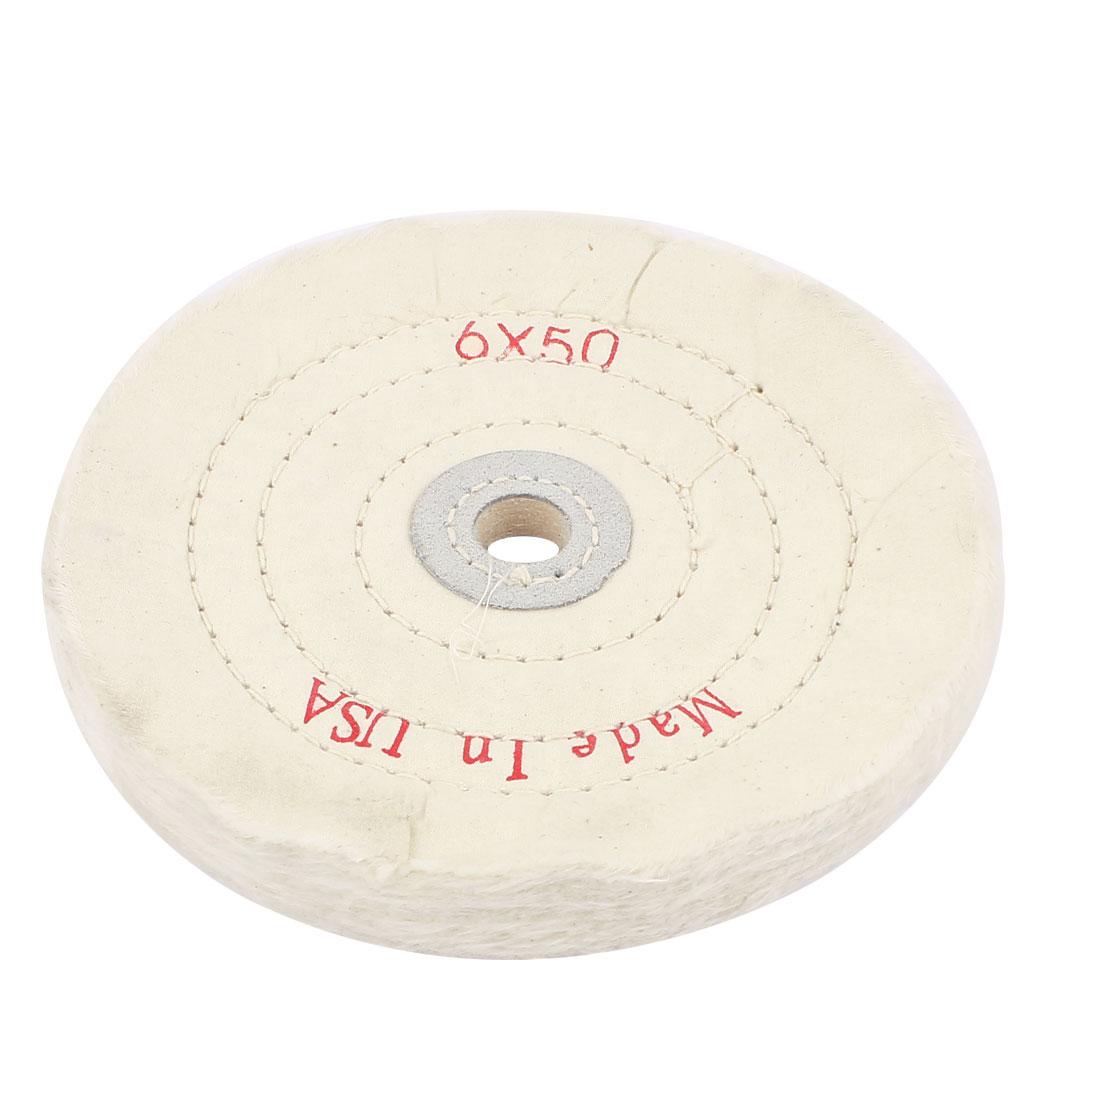 "5/8"" Arbor Hole 6"" x 50-Ply Soft Cotton Muslin Full Sewn Polishing Wheel"